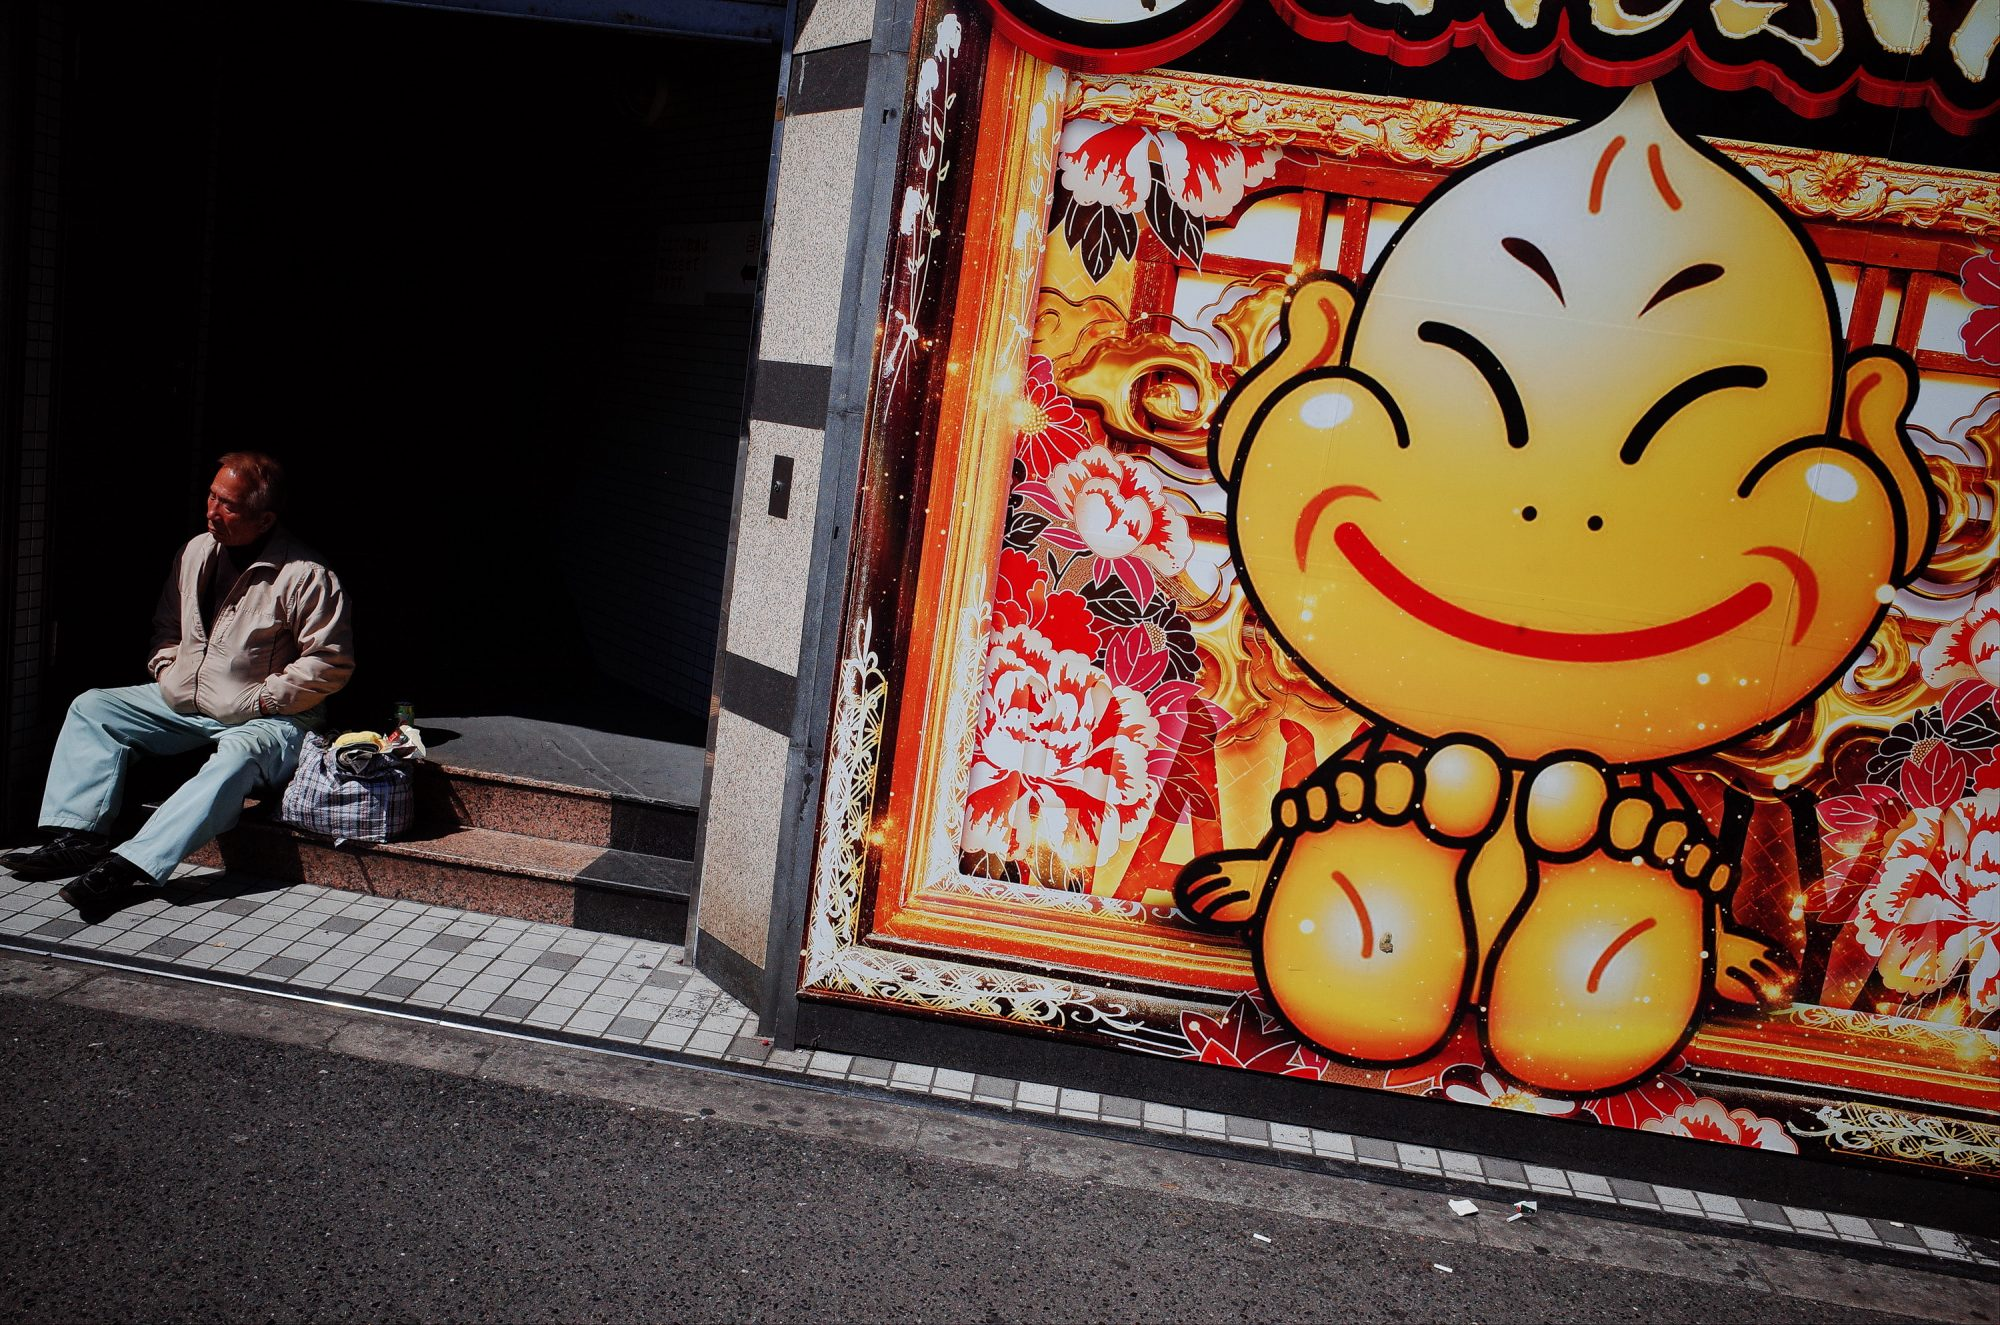 Street scene with man in front of Pachinko. Osaka, 2018